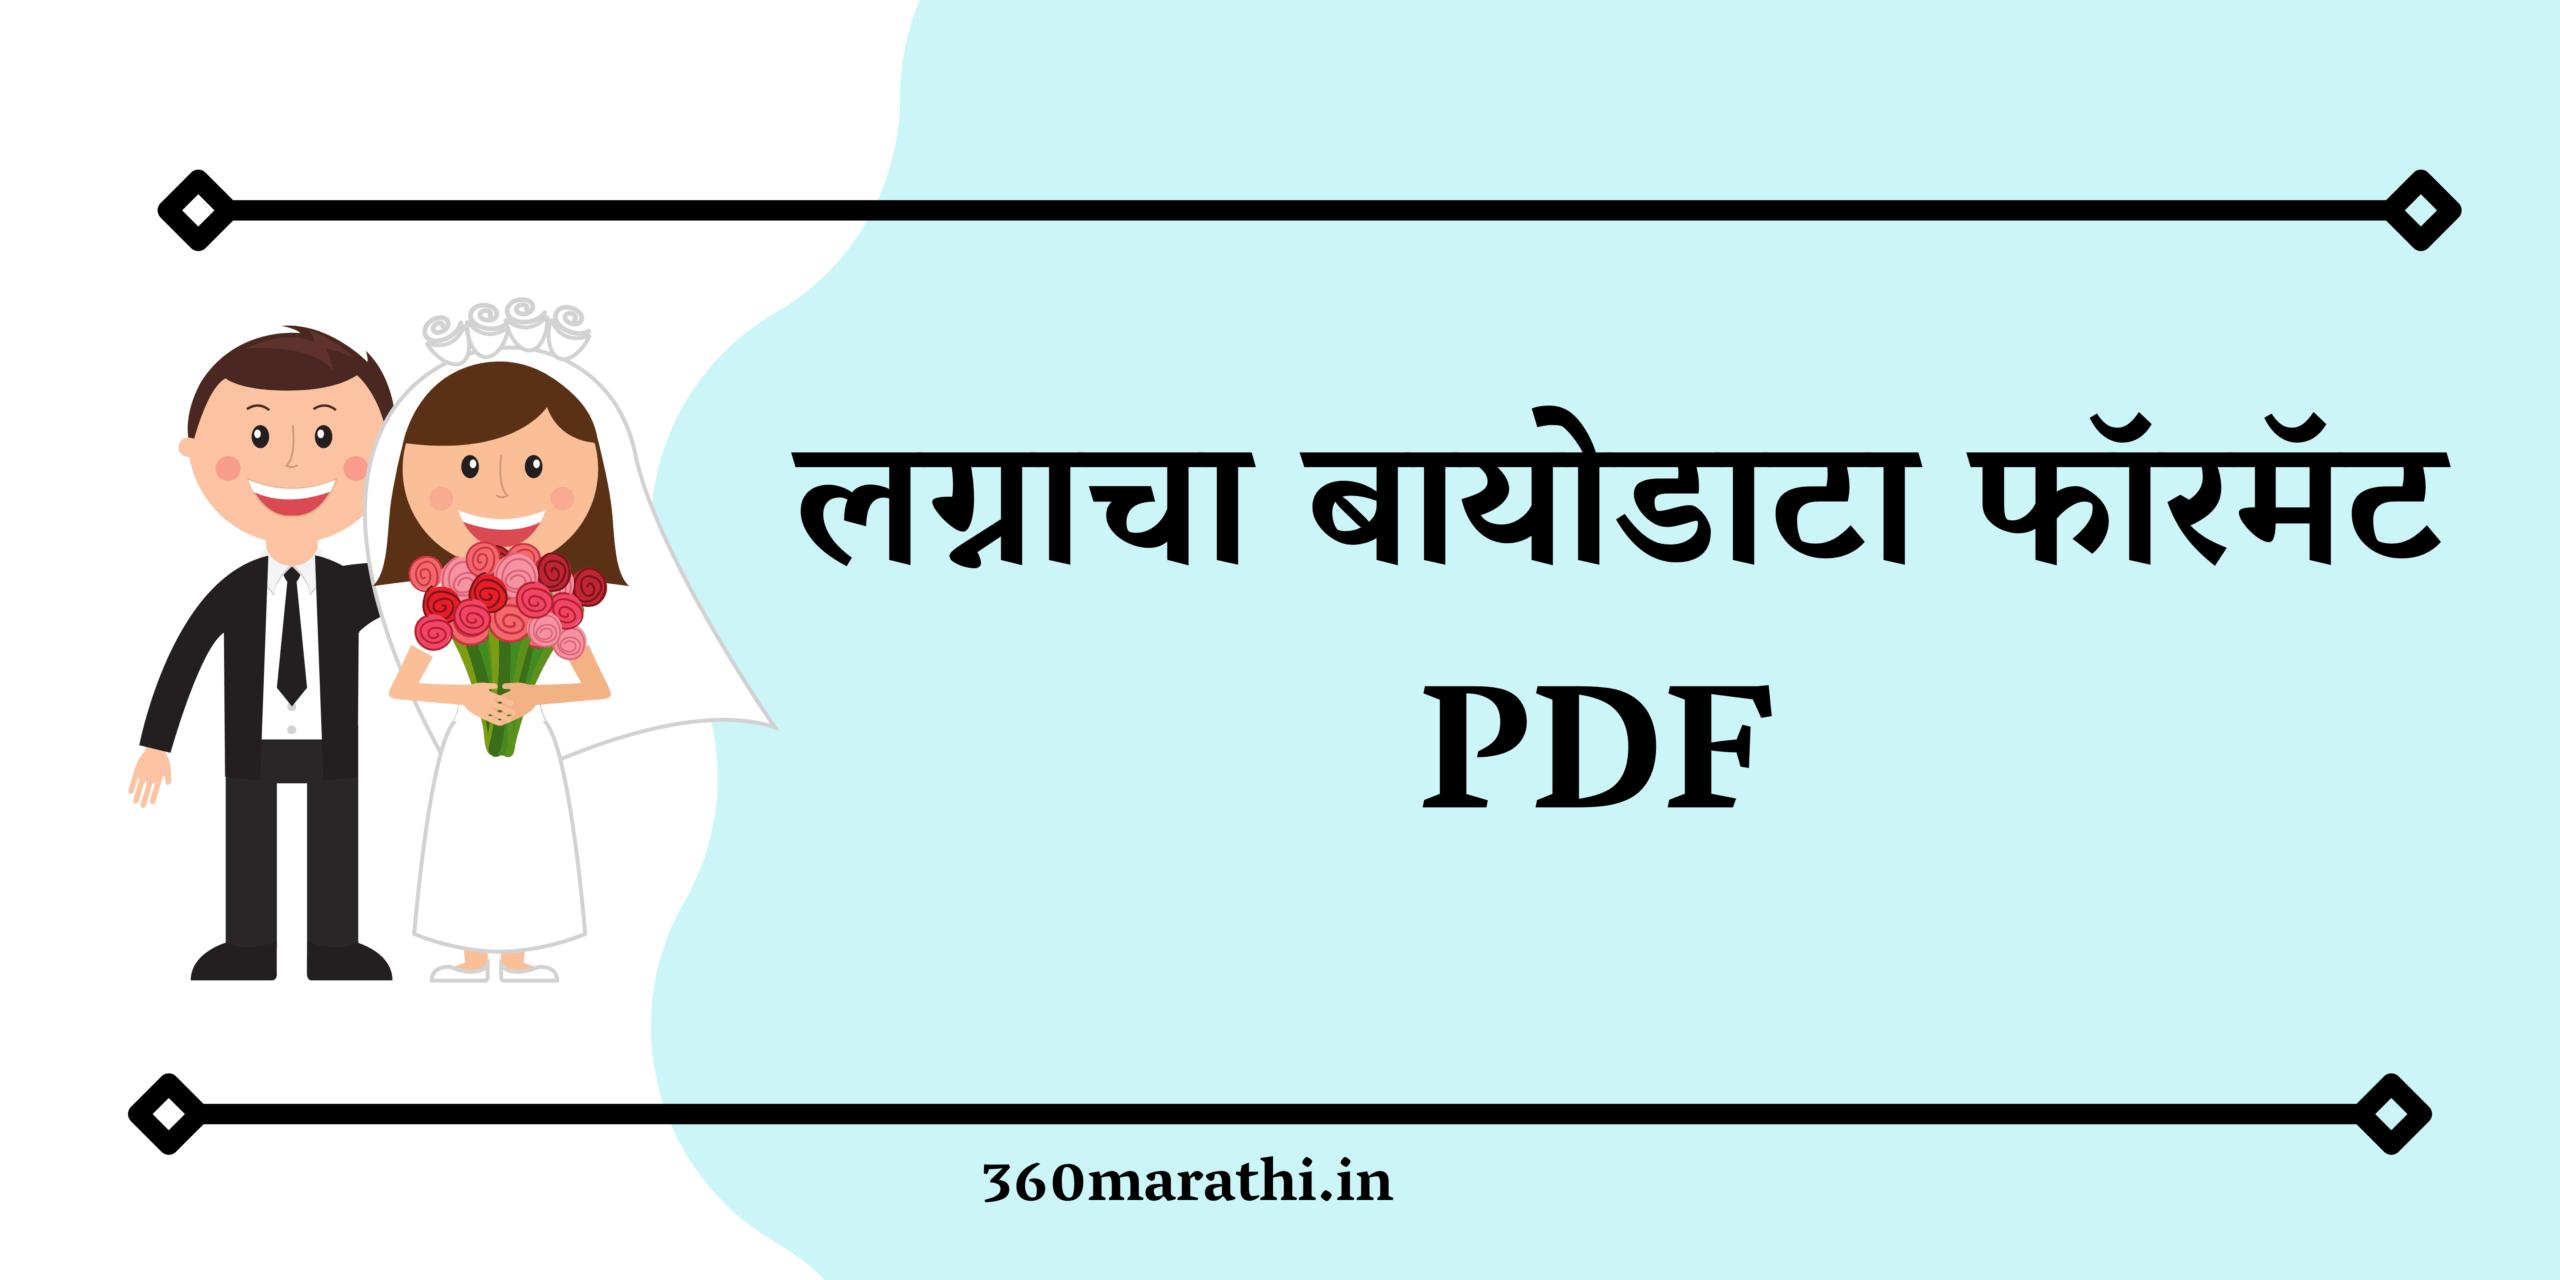 Marriage Biodata Format in Marathi PDF Download | लग्नाचा बायोडाटा फॉरमॅट